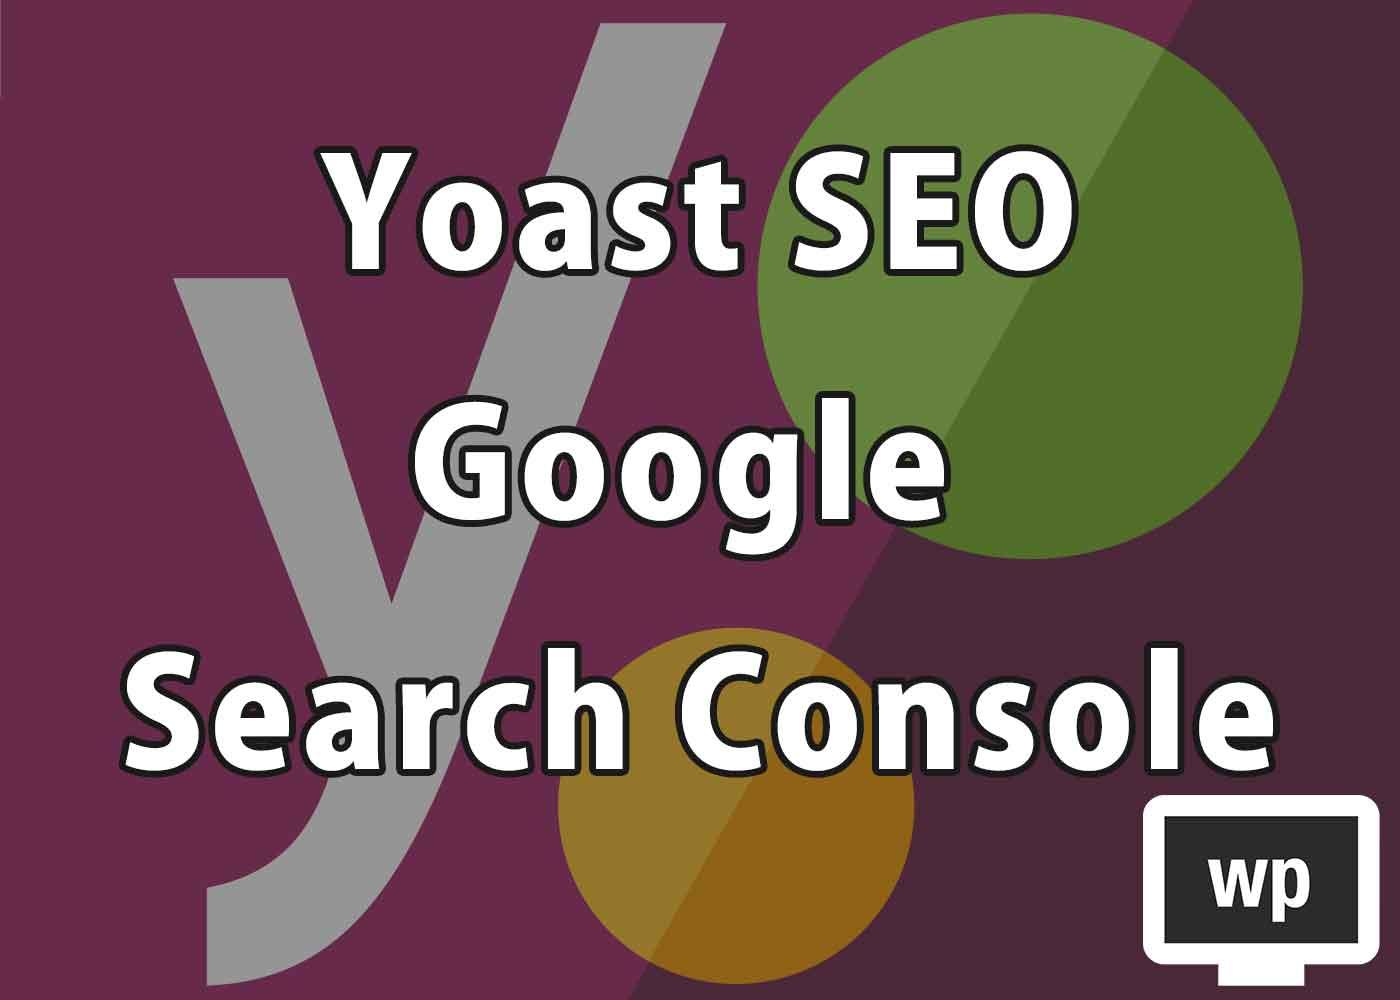 Lv.05 Yoast SEO - Googleサーチコンソール